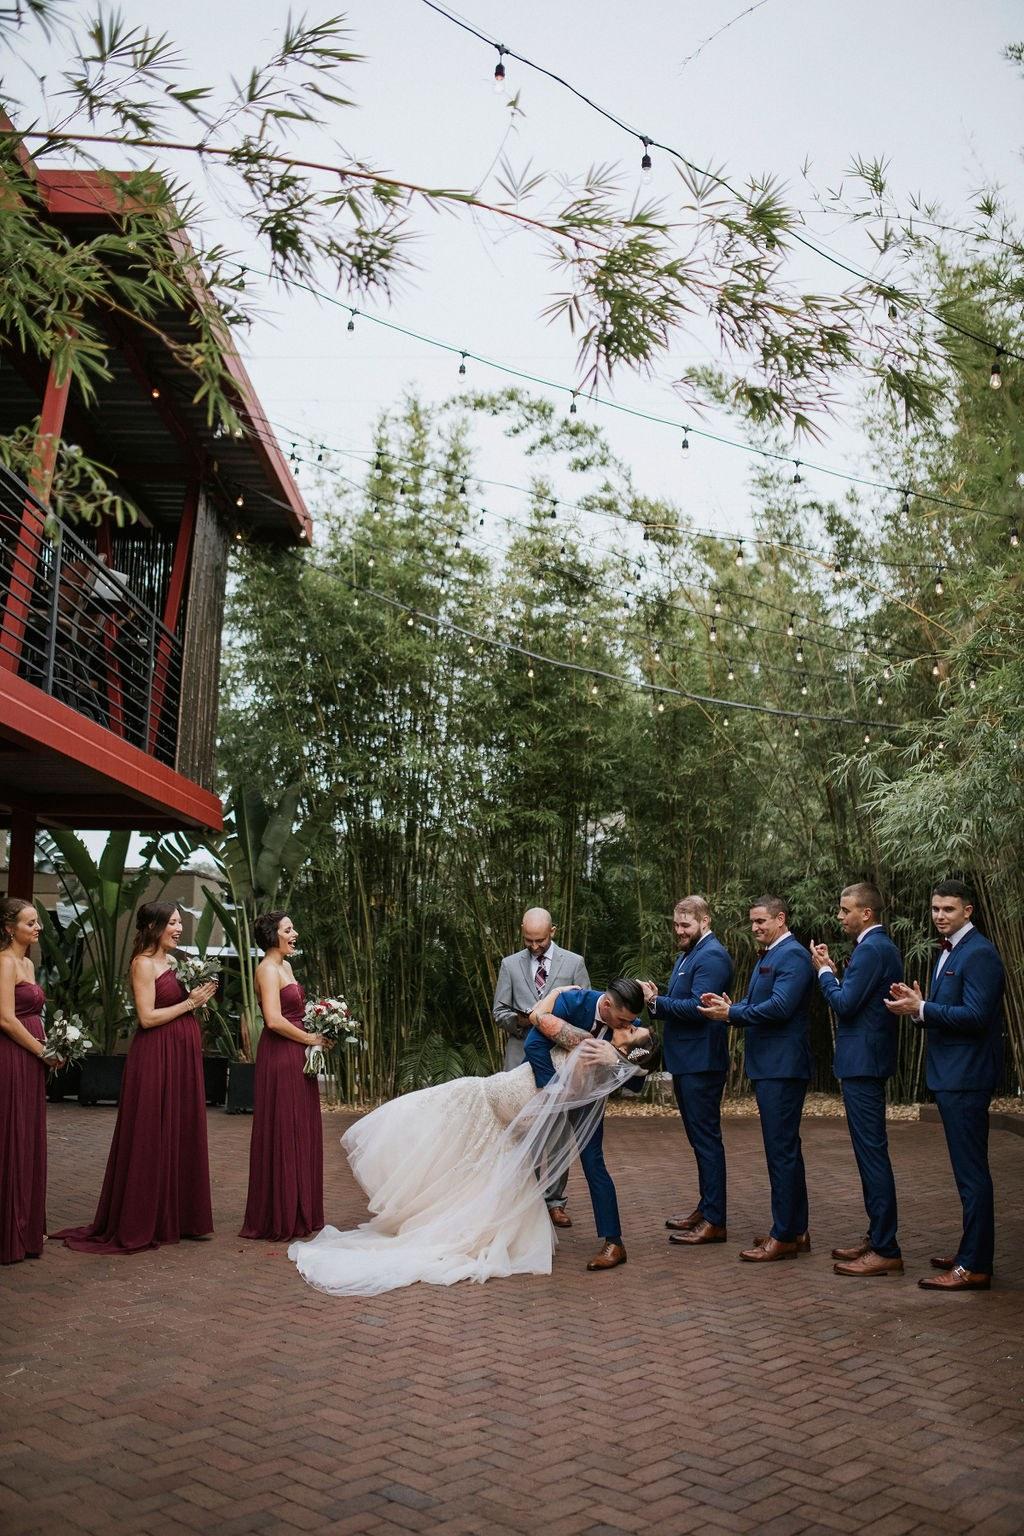 Wedding ceremony in bamboo gardens at NOVA 535 in St. Pete